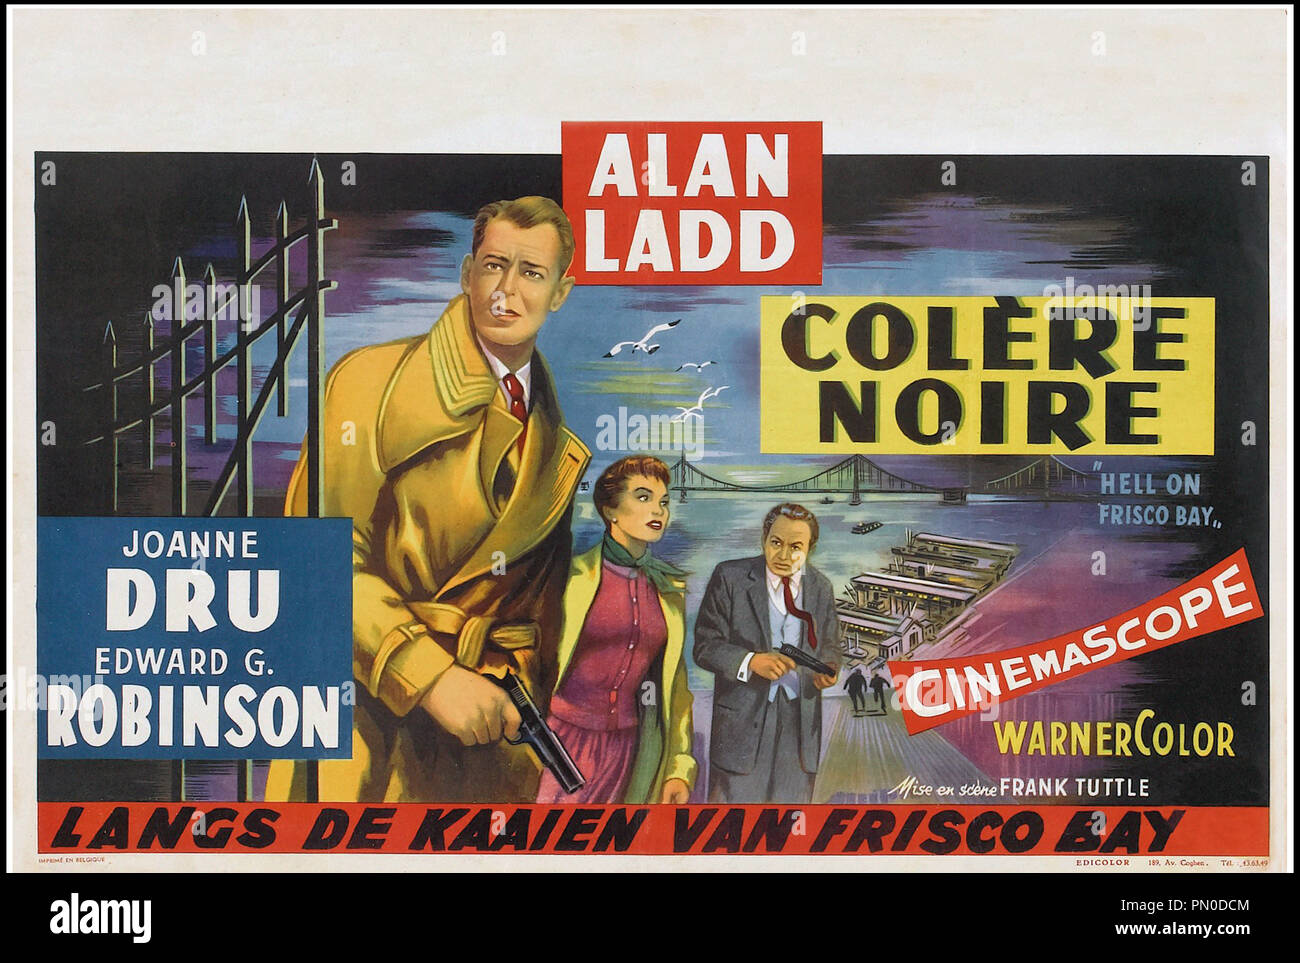 Hell on Frisco Bay Alan Ladd Edward G Robinson movie poster print 2